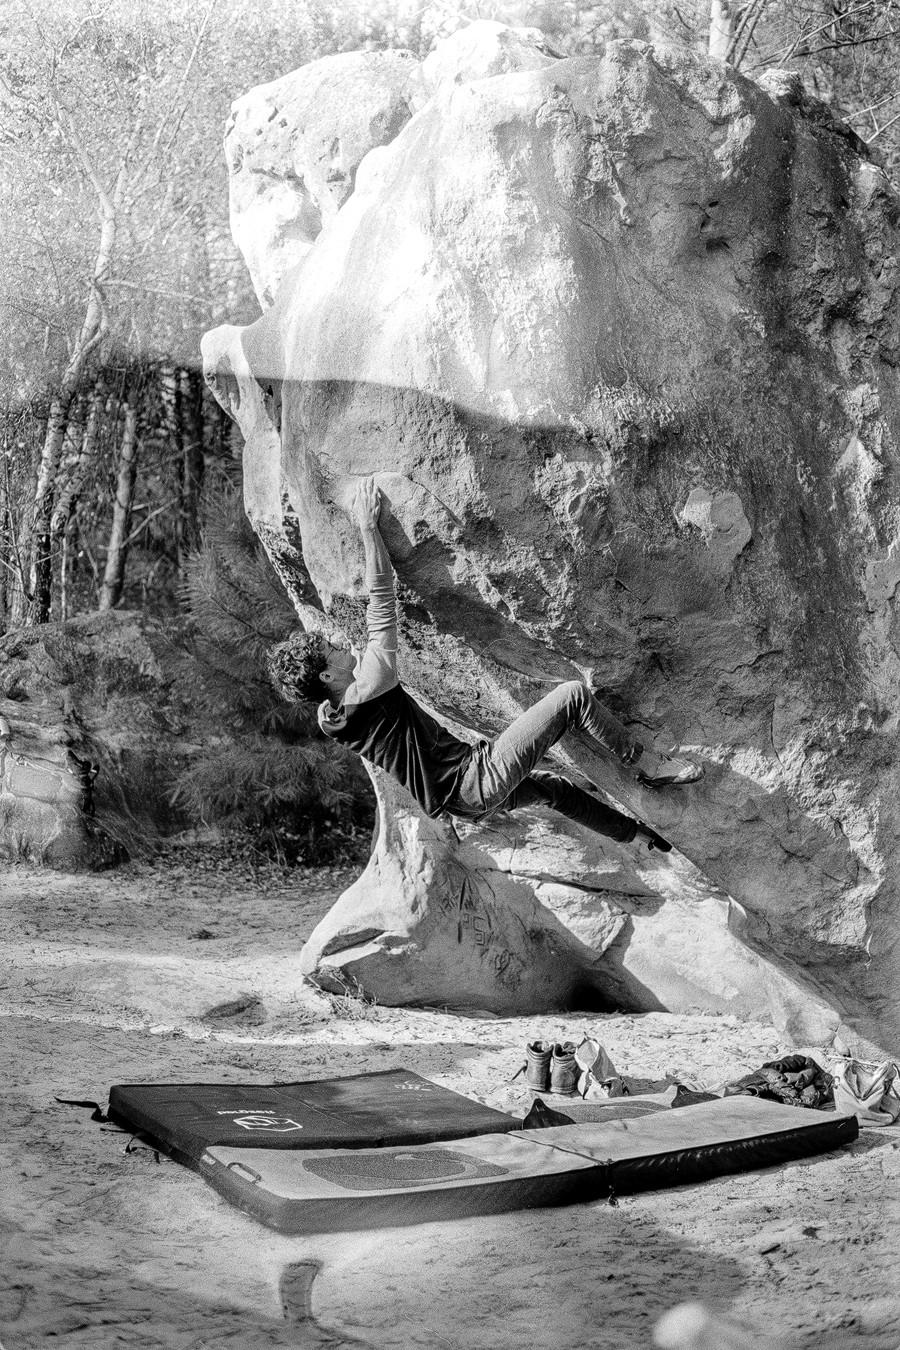 Bouldern Sportfotografie bastianpaas.de Fontainebleau